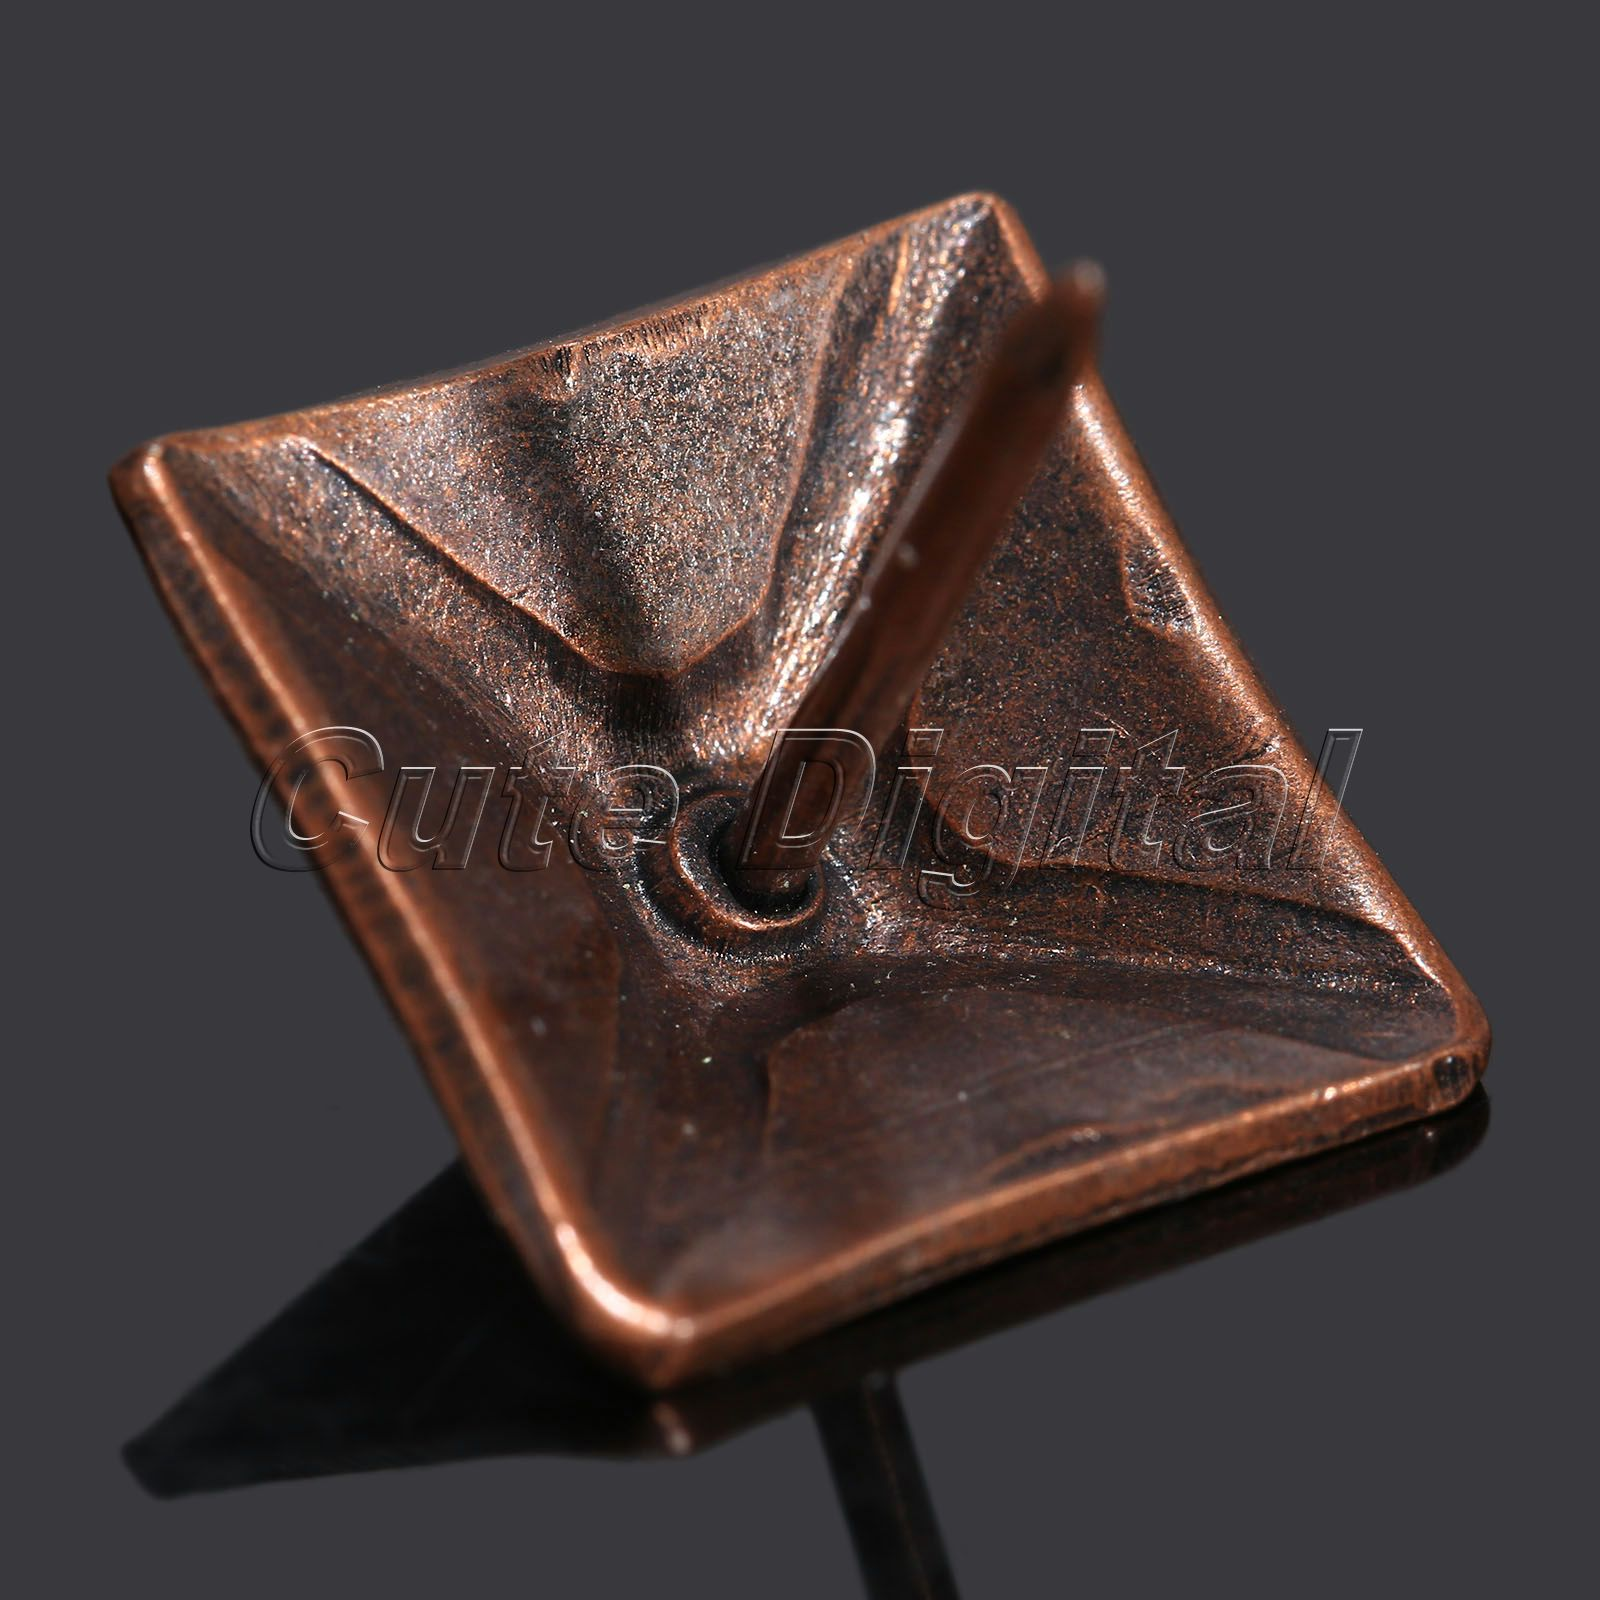 decorative studs for furniture. 50pcs decorative tachas upholstery tacks bronze antique square studs for furniture